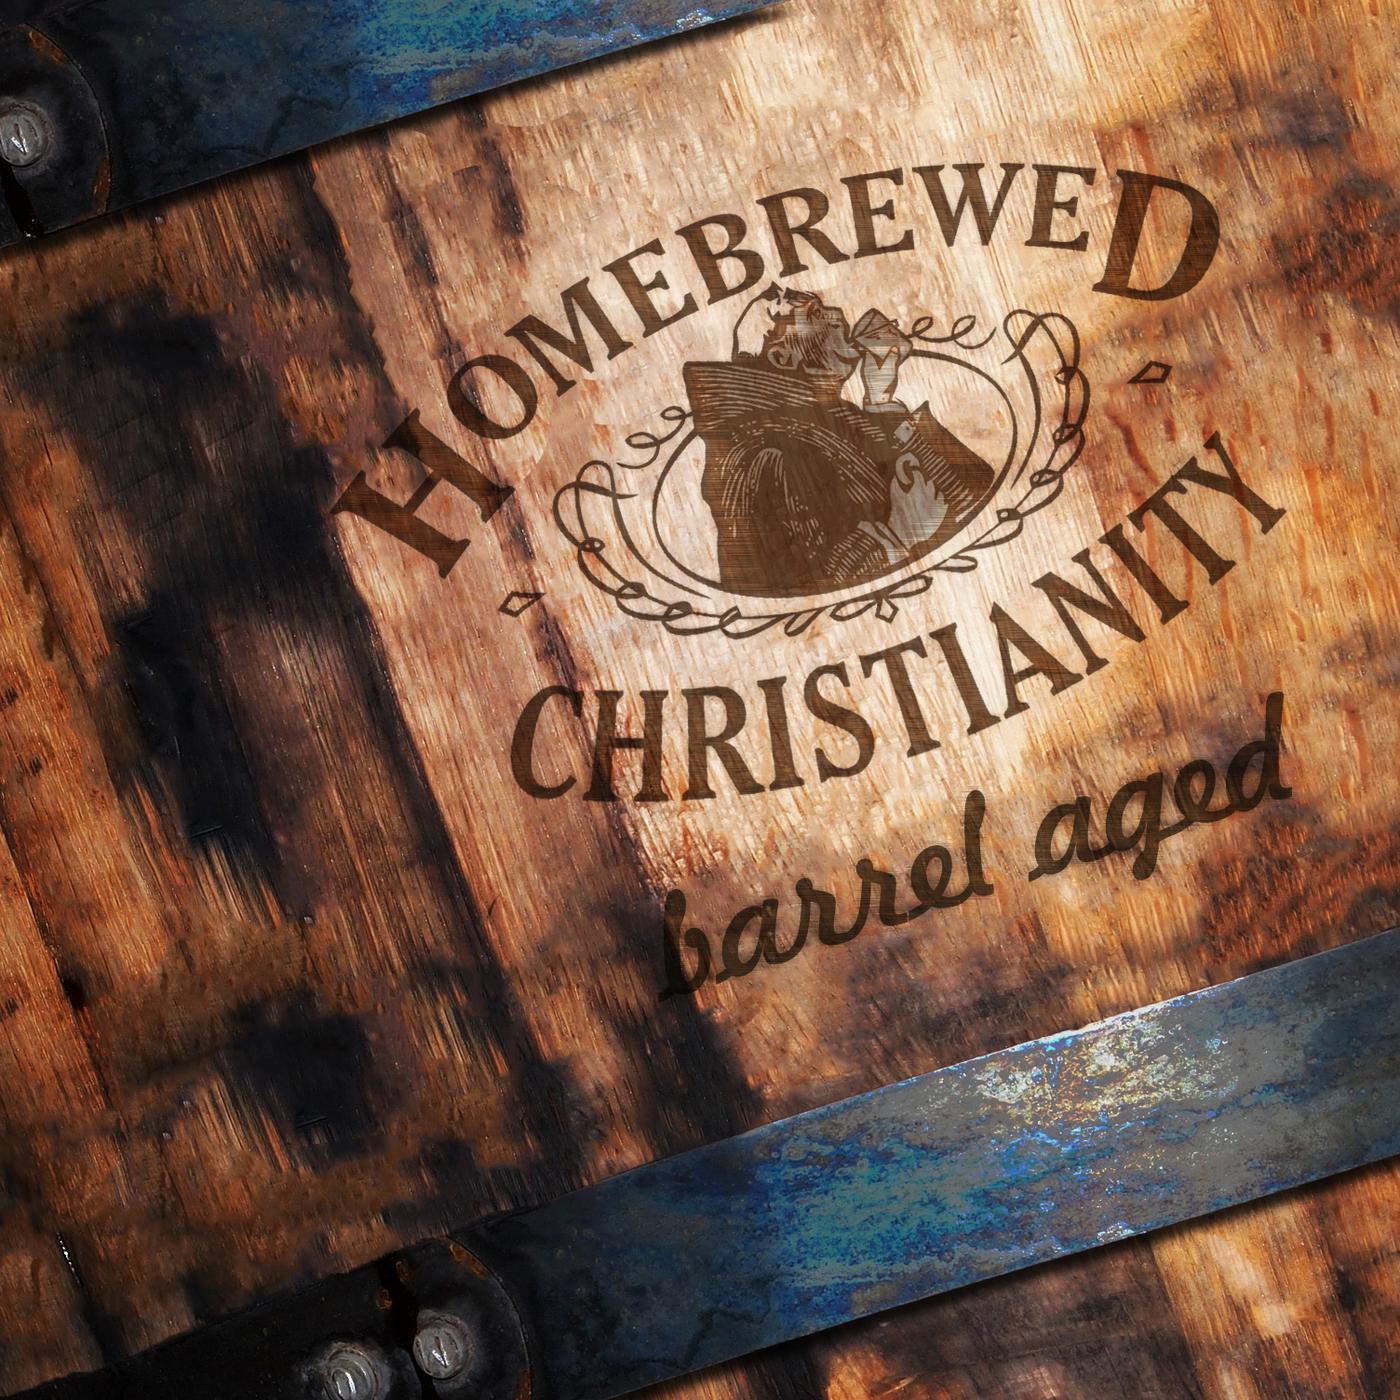 Barrel Aged – Robert Mesle intro to Whitehead - Theology ...